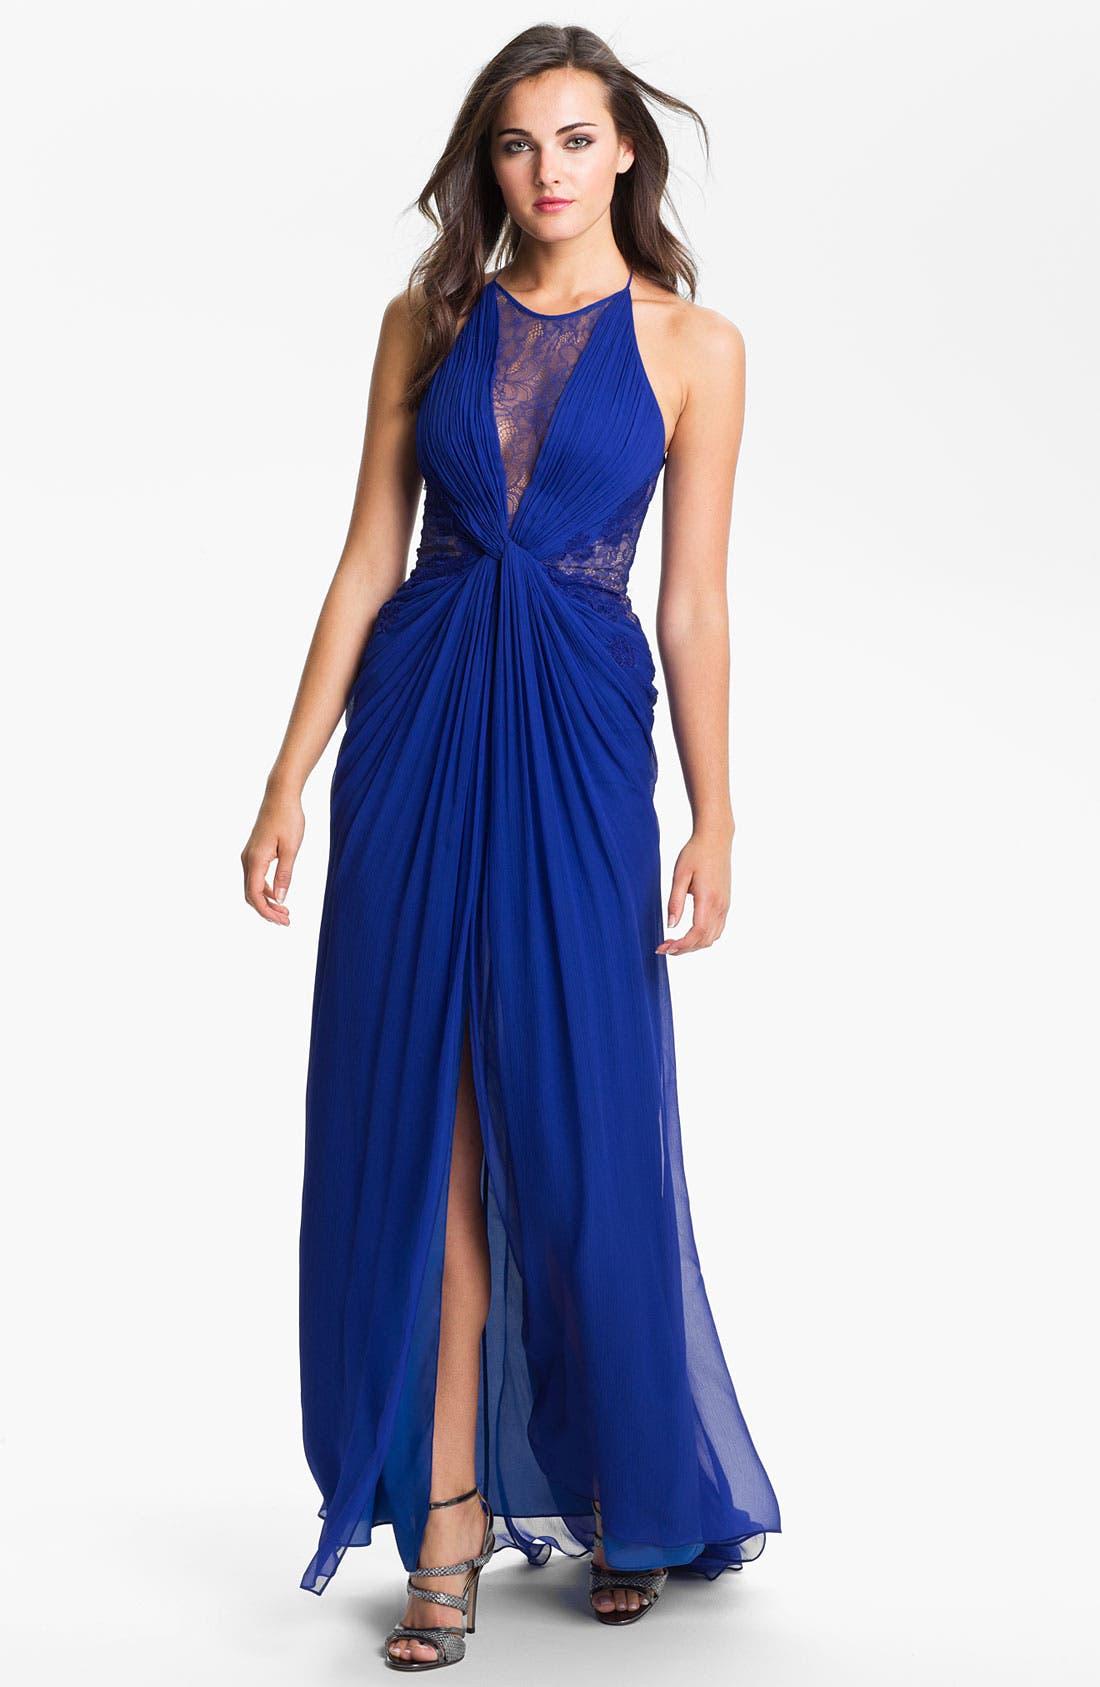 Main Image - BCBGMAXAZRIA Lace Inset Textured Silk Chiffon Gown